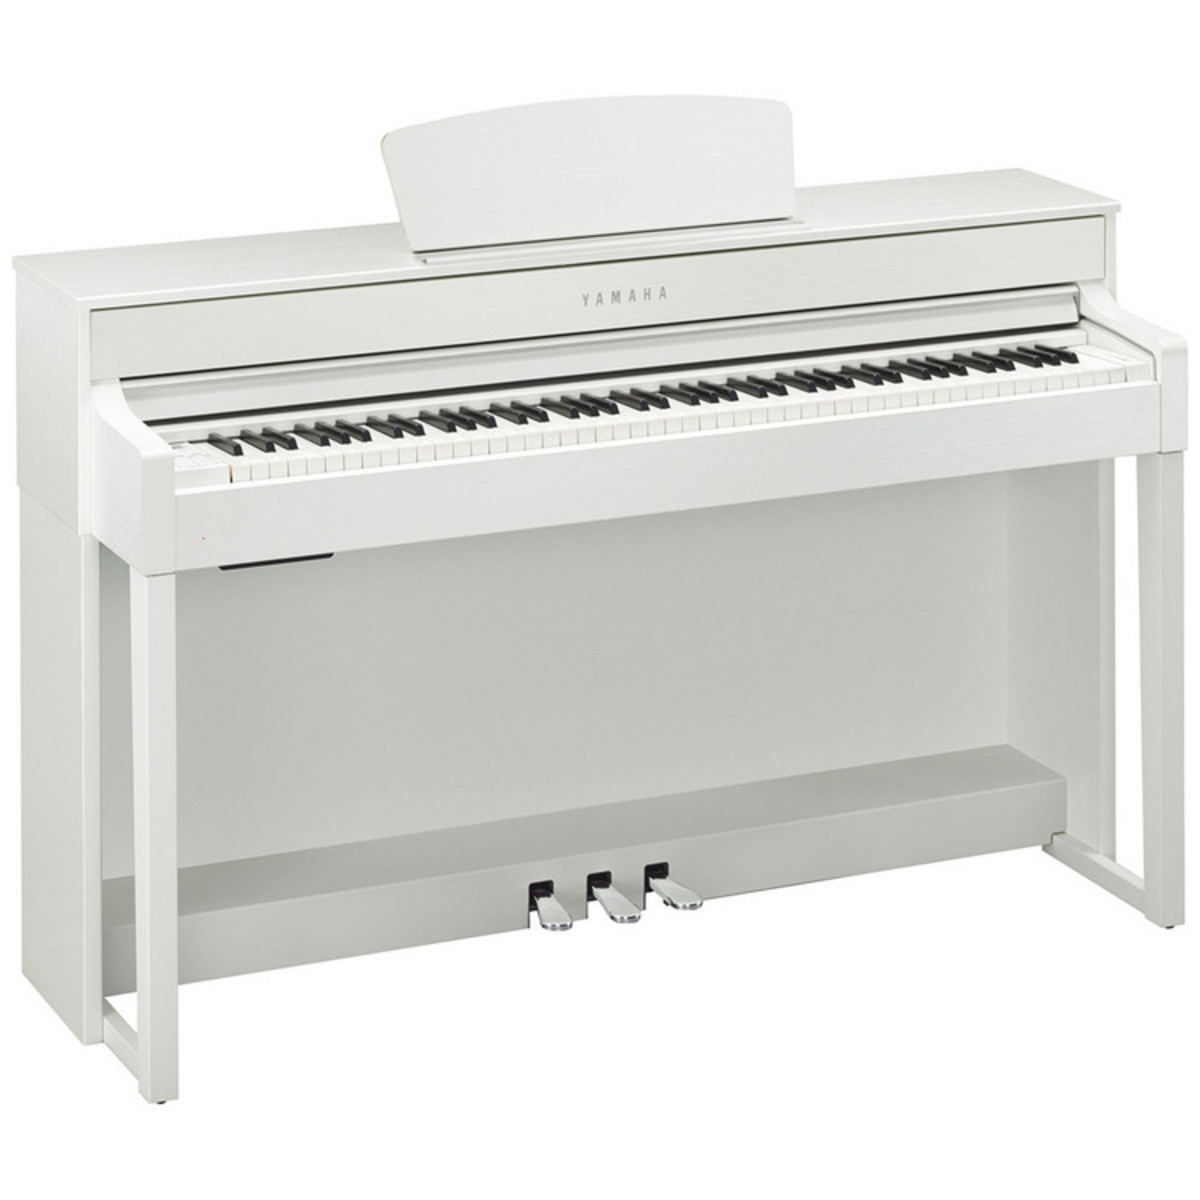 yamaha clavinova clp535 digital piano white at. Black Bedroom Furniture Sets. Home Design Ideas